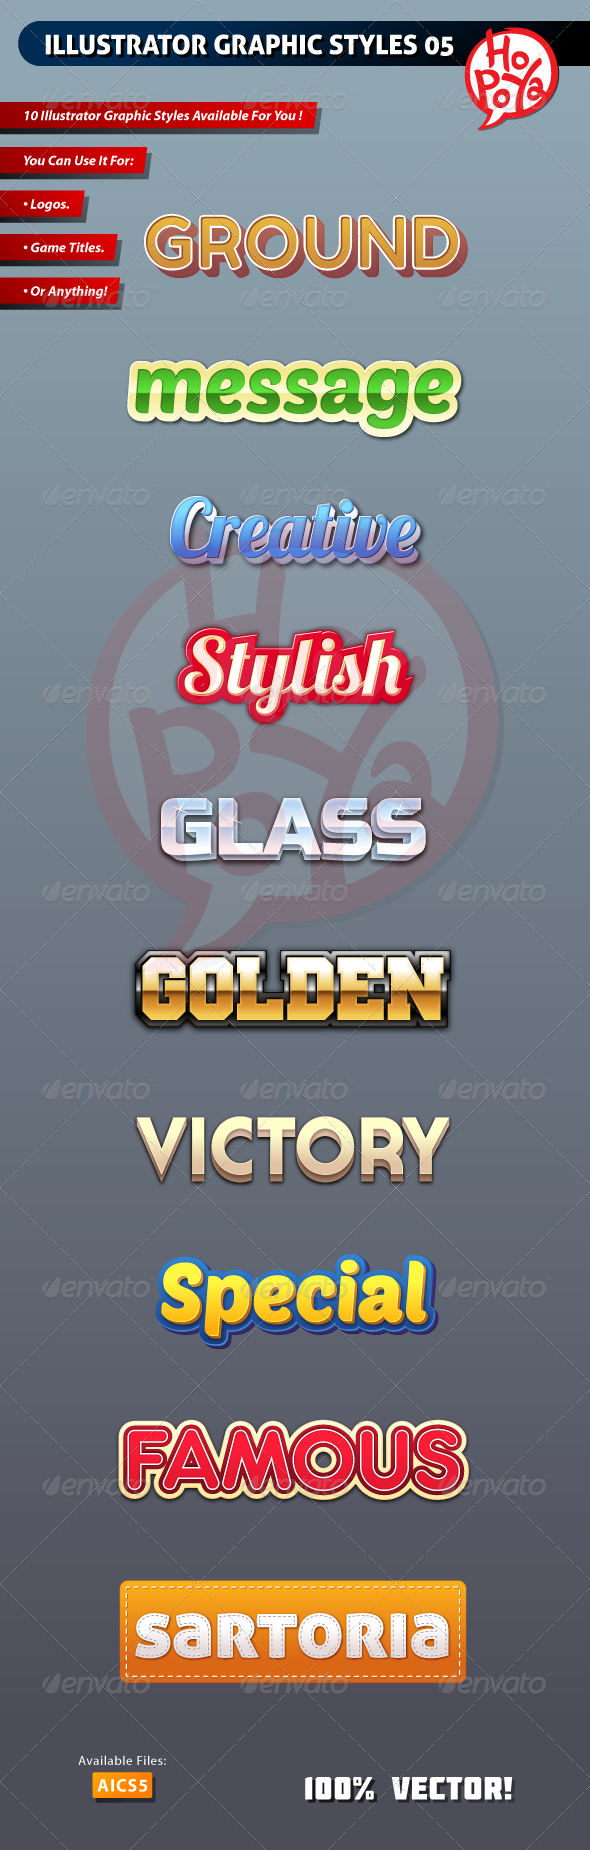 GraphicRiver Illustrator Graphic Styles 05 7826431